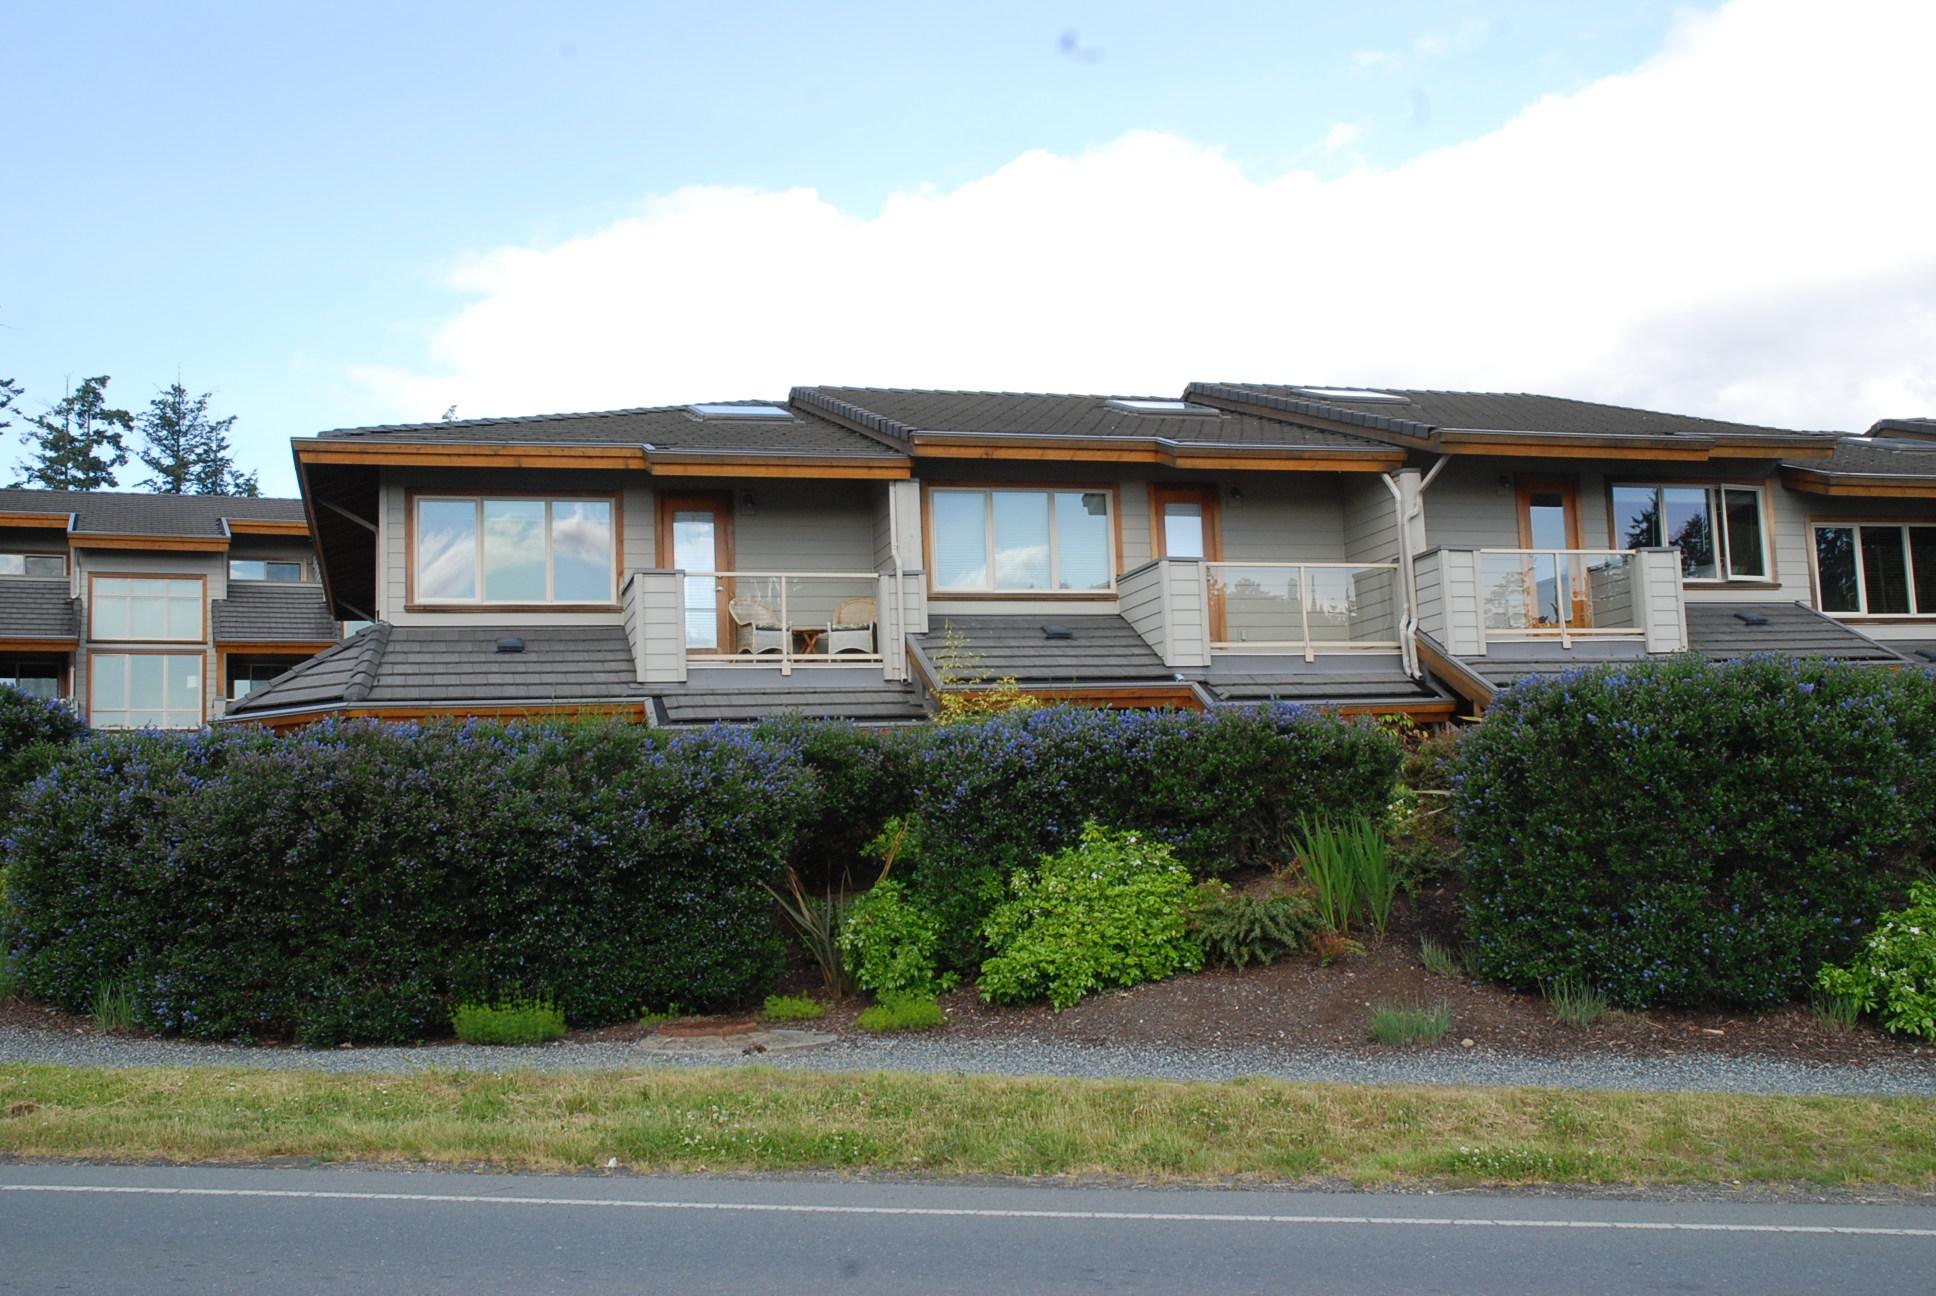 Condos Salt Spring Island Real Estate